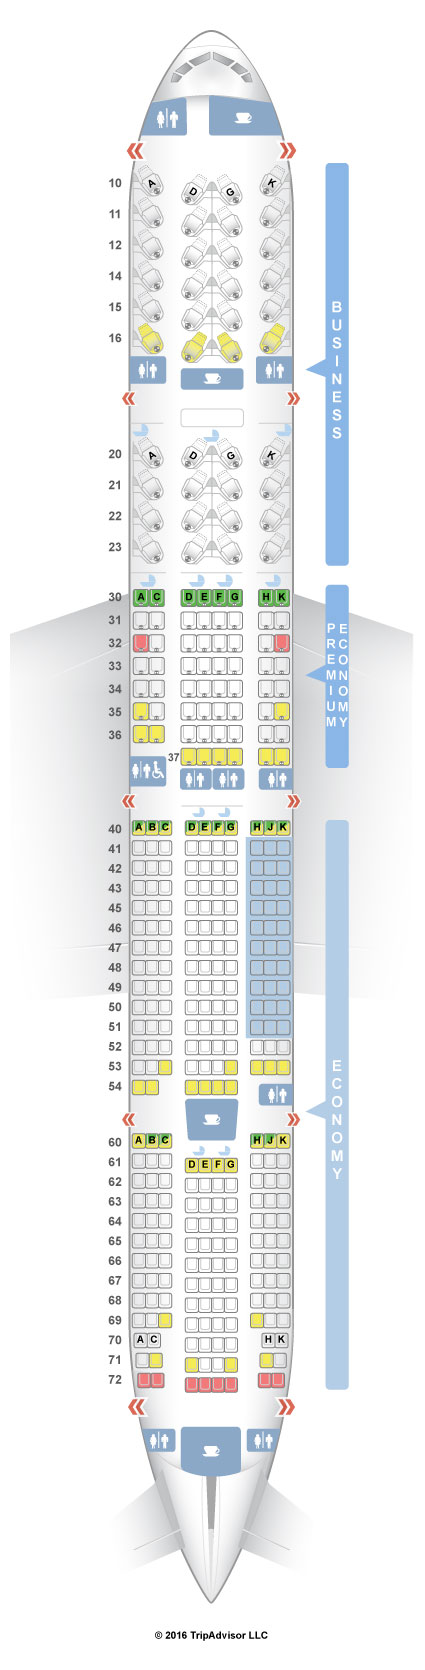 SeatGuru Seat Map China Airlines - SeatGuru on 777 seat plan, 777 seat diagram, delta a380 seating map, 777 seat profile, 777 seat configuration,